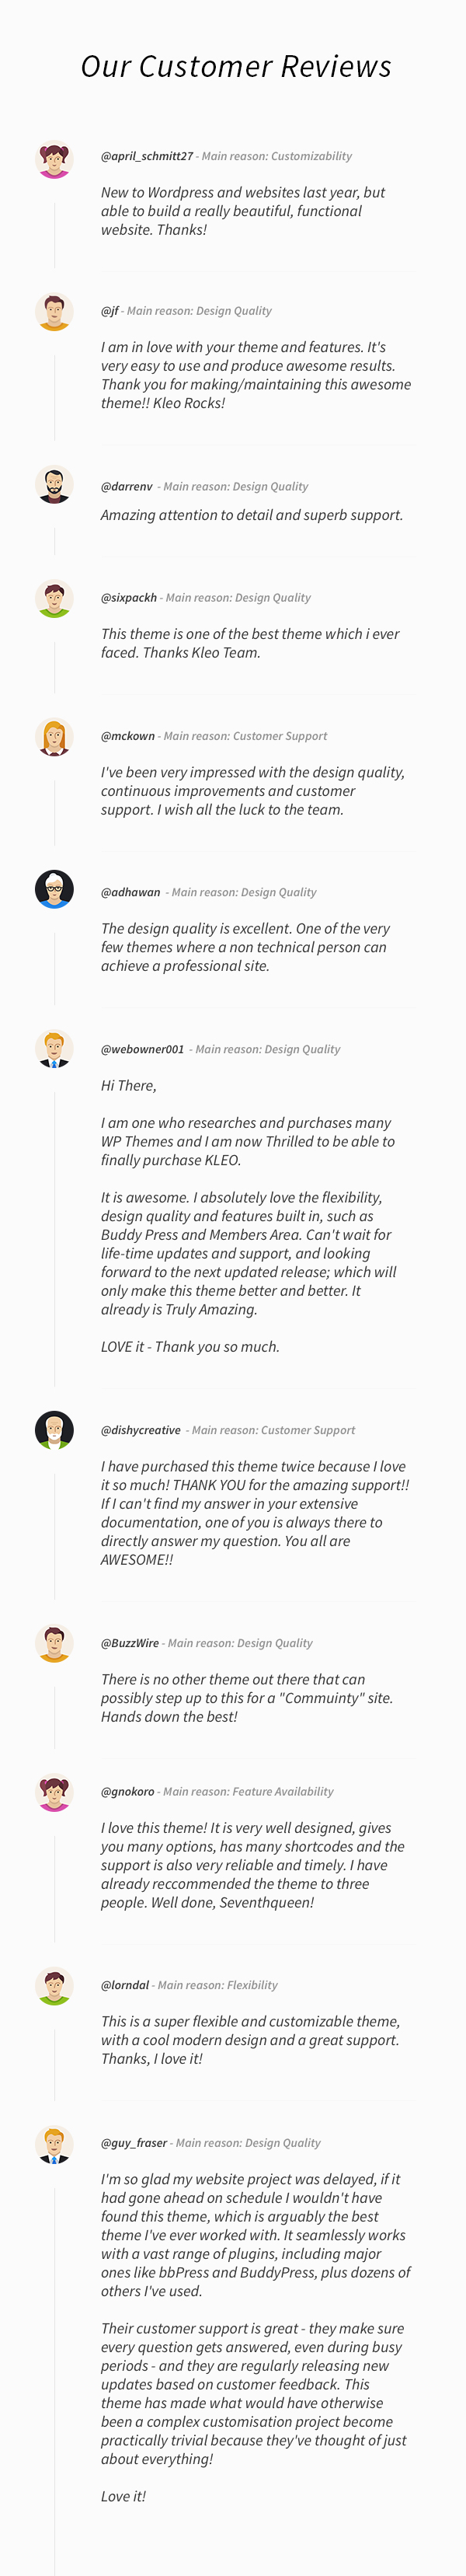 KLEO - Pro Community Focused, Multi-Purpose BuddyPress Theme - 6